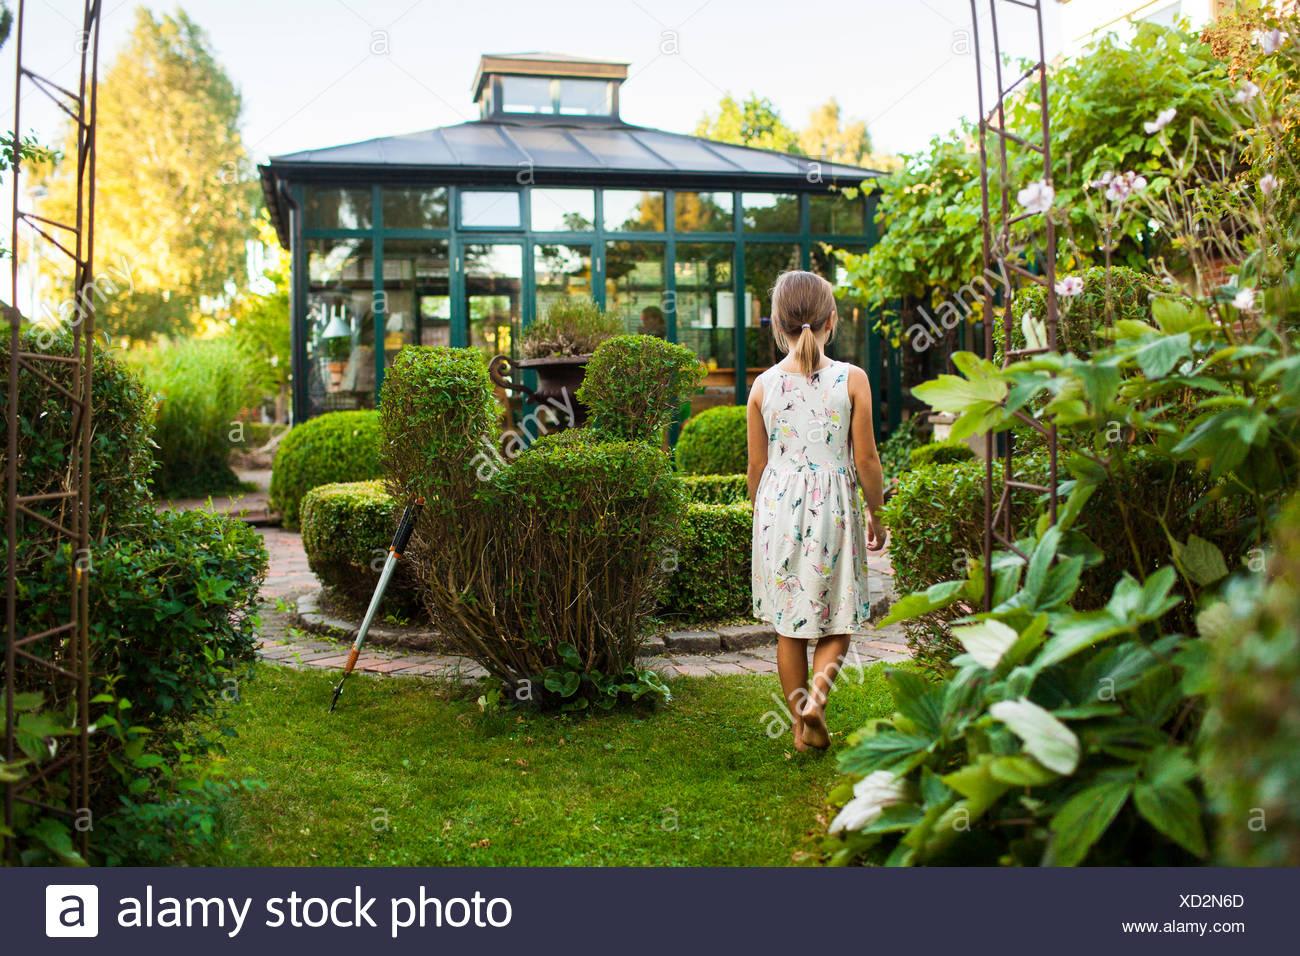 Rear view of girl walking in garden - Stock Image